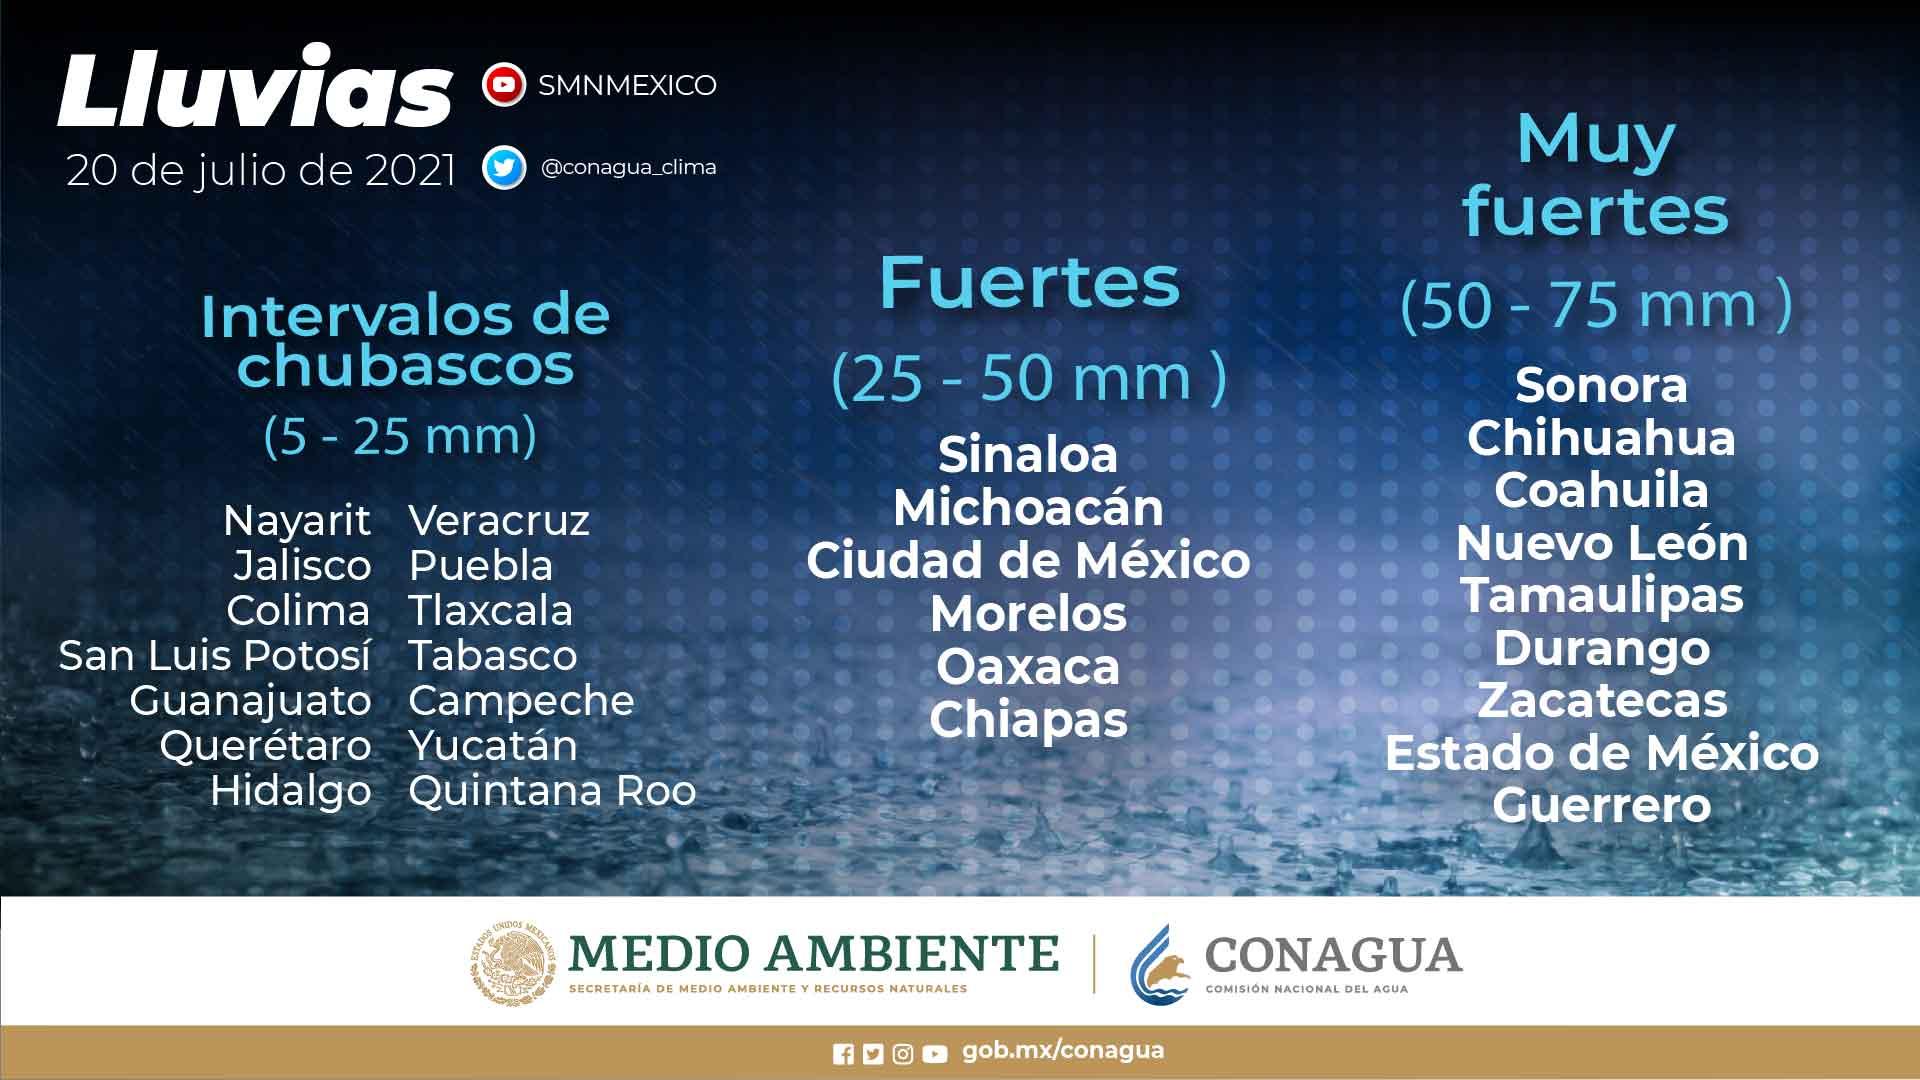 Continúa el pronóstico de lluvias para Tlaxcala esta semana